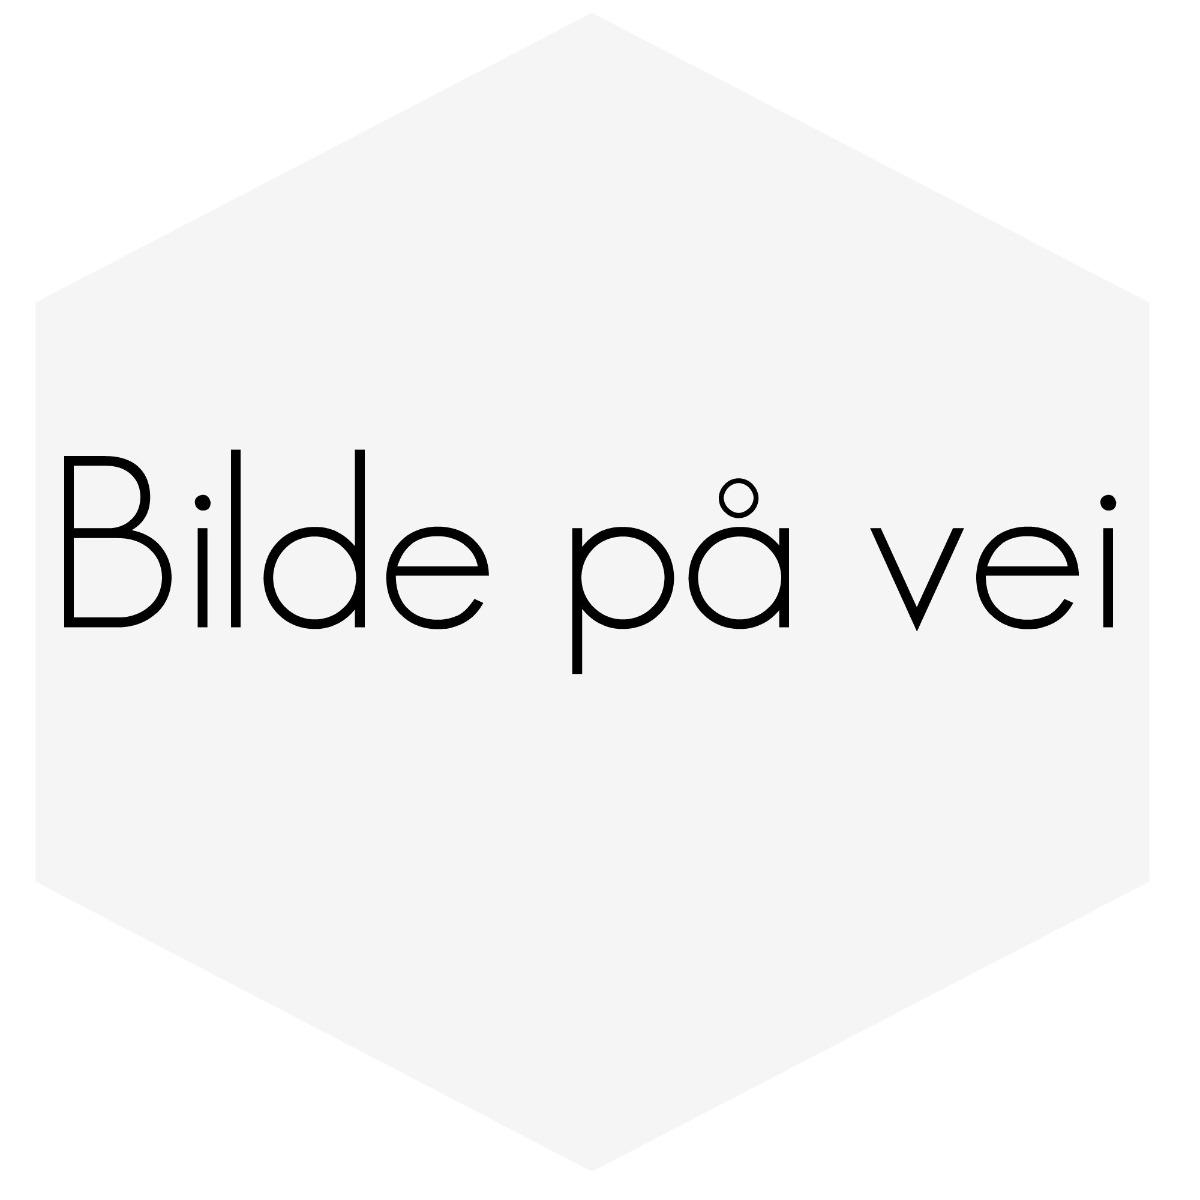 DØRHÅNDTAK UTVENDIG VOLVO 740/940 HELSORT VENSTRE 6846646